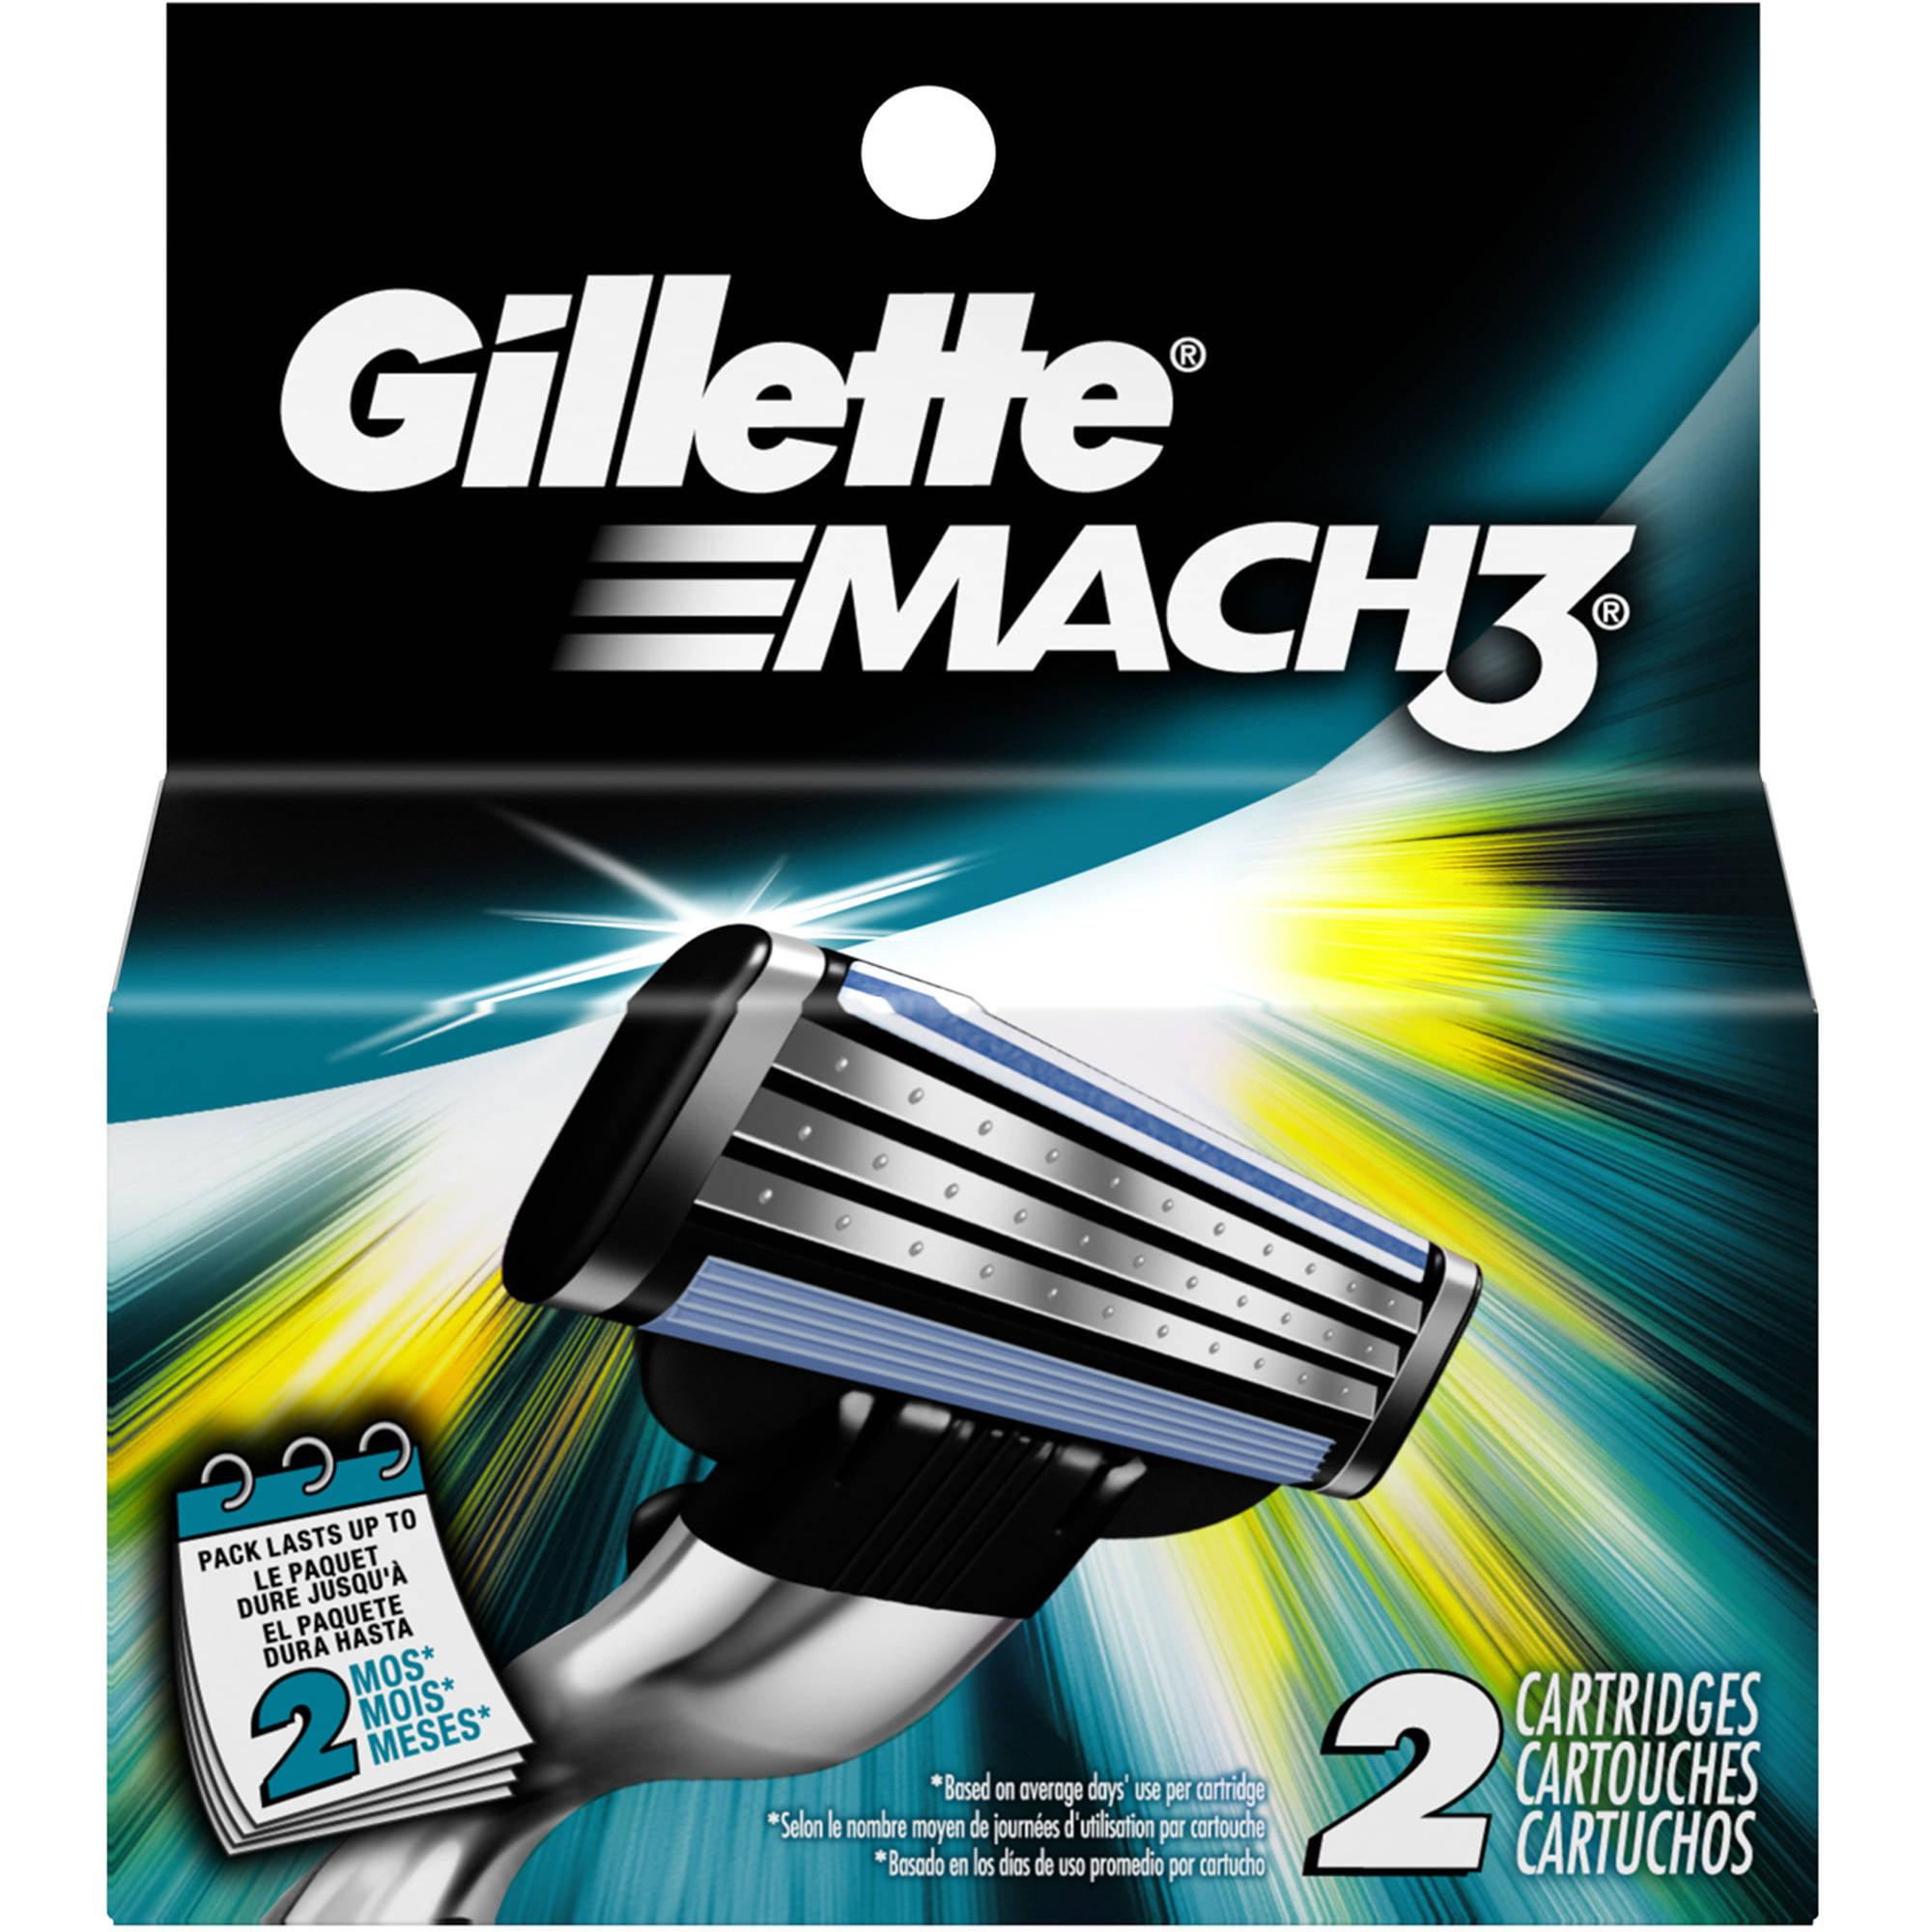 Gillette Mach3 Men's Razor Refill Cartridges, 2 count